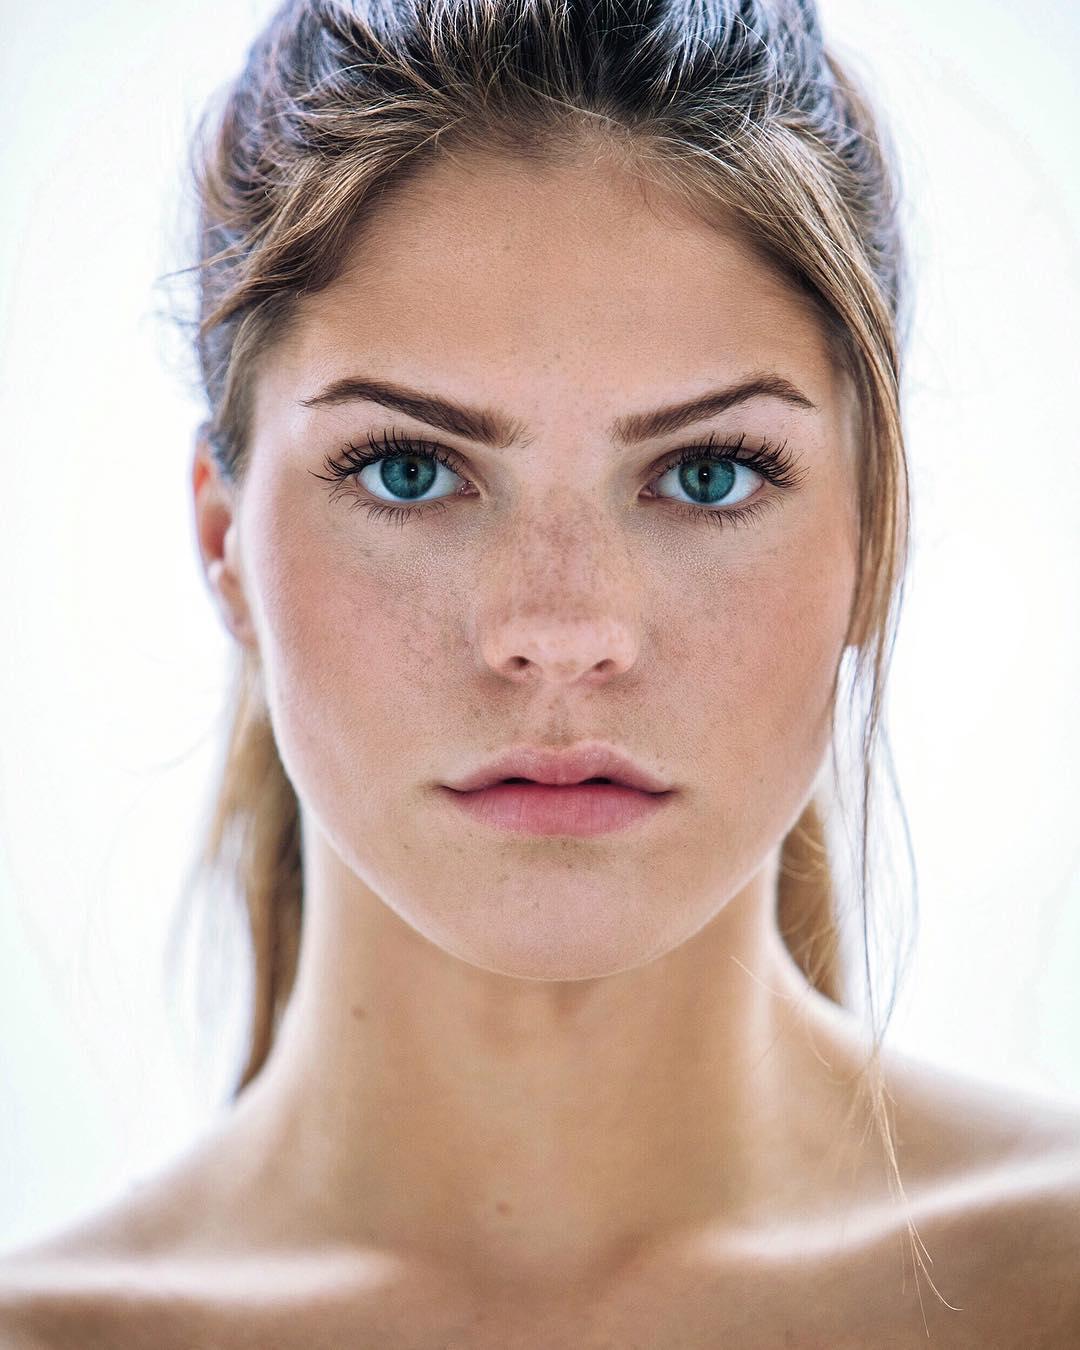 Ashley-Bedard-Wallpapers-Insta-Fit-Bio-7